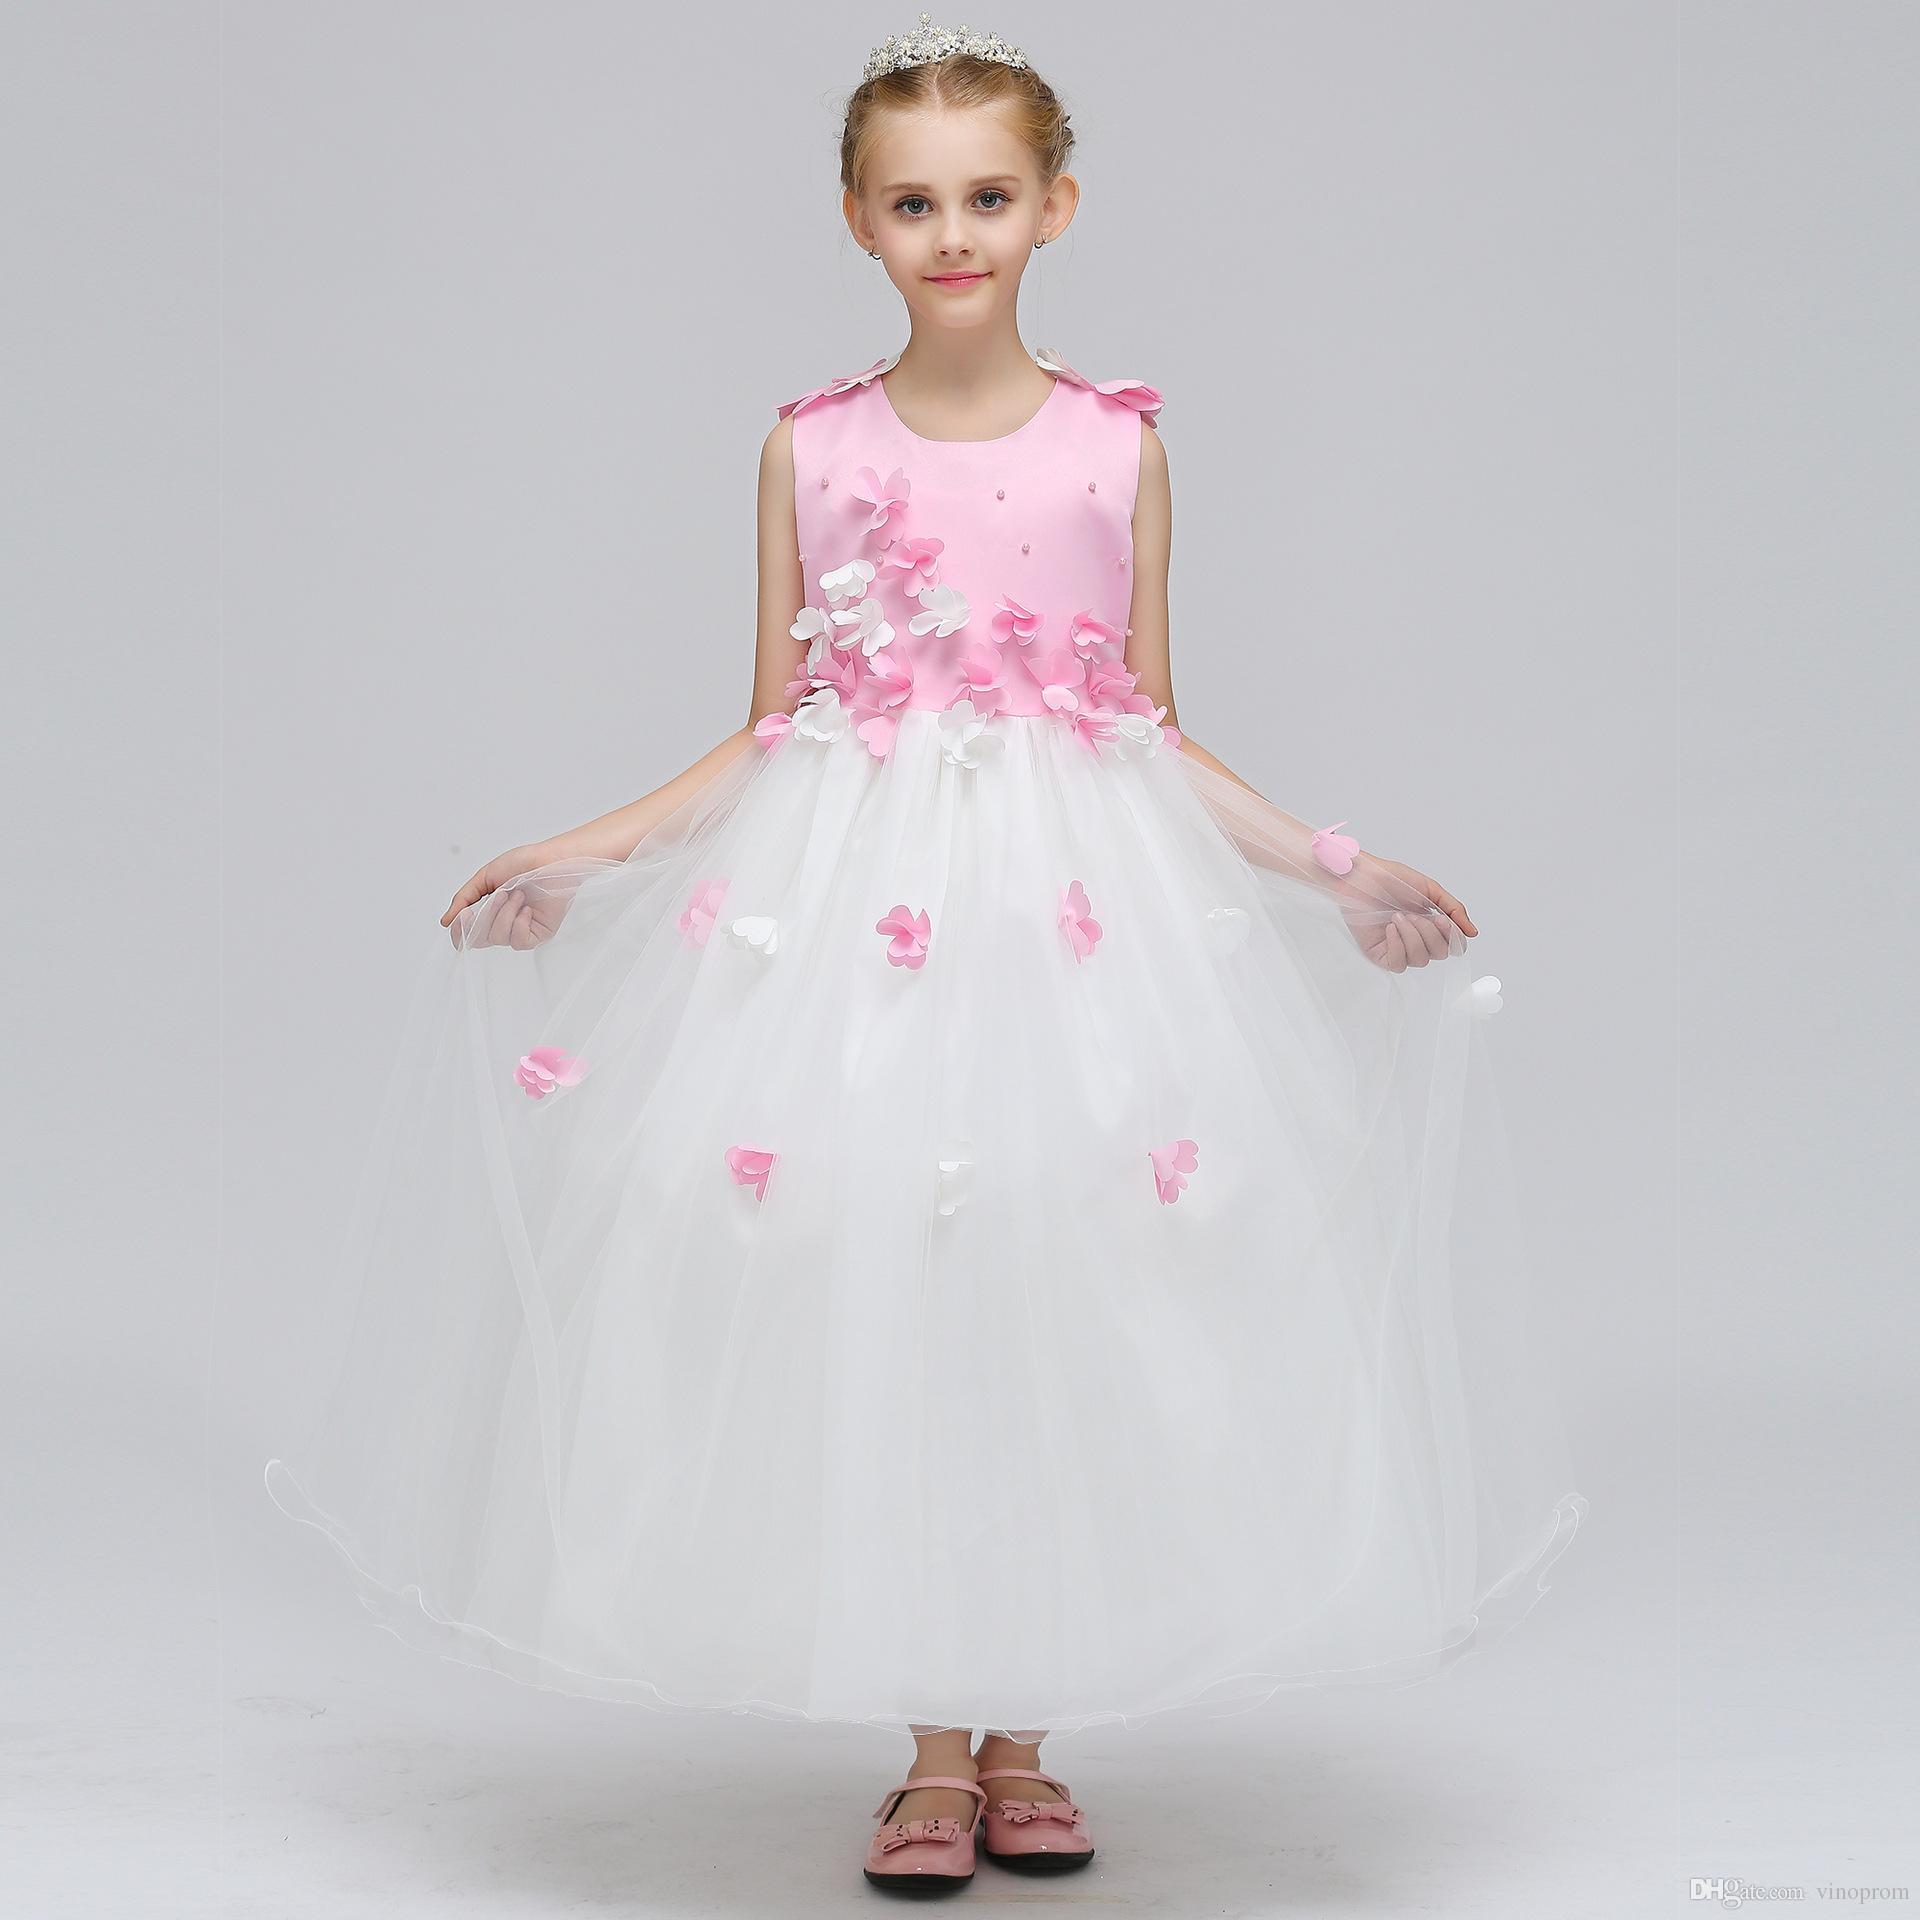 2018 Cap Sleeve Lace Flower Girls Abiti Due pezzi Tulle Lovely Little Kids Gonne Tea Princess Princess Comunione Abiti di compleanno